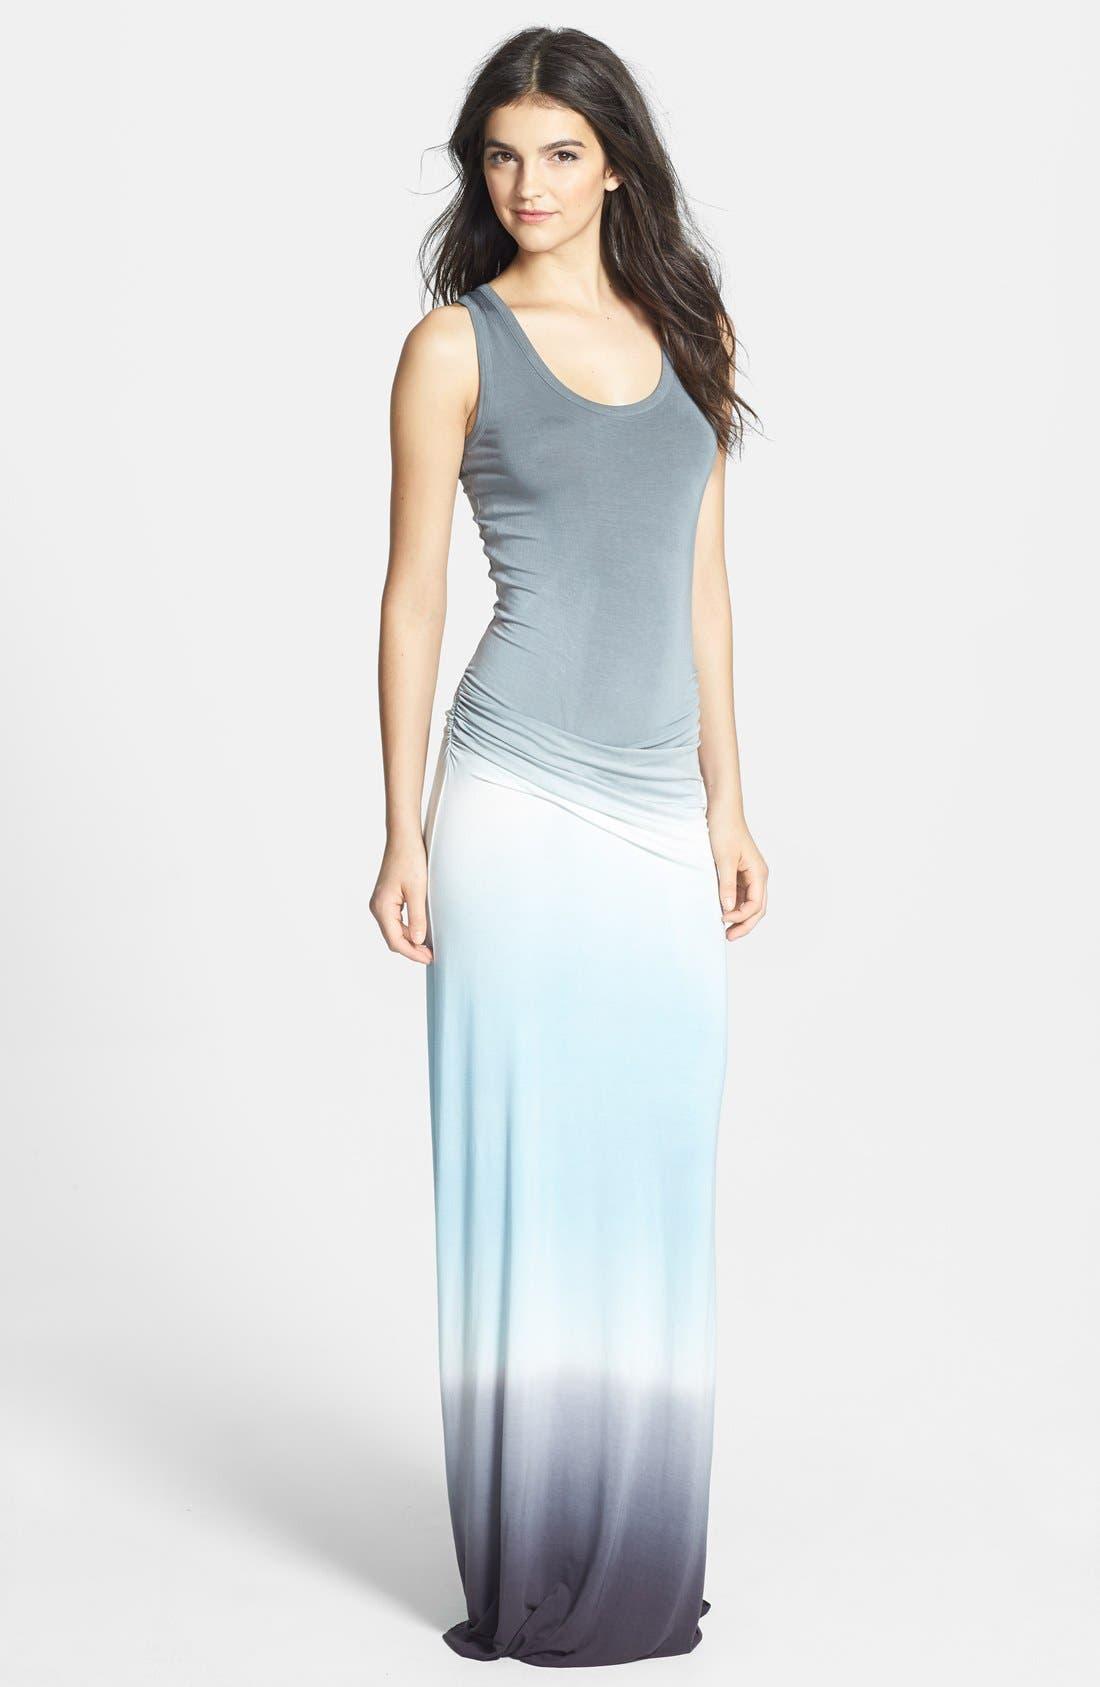 Main Image - Young, Fabulous & Broke 'Hamptons' Racerback Maxi Dress